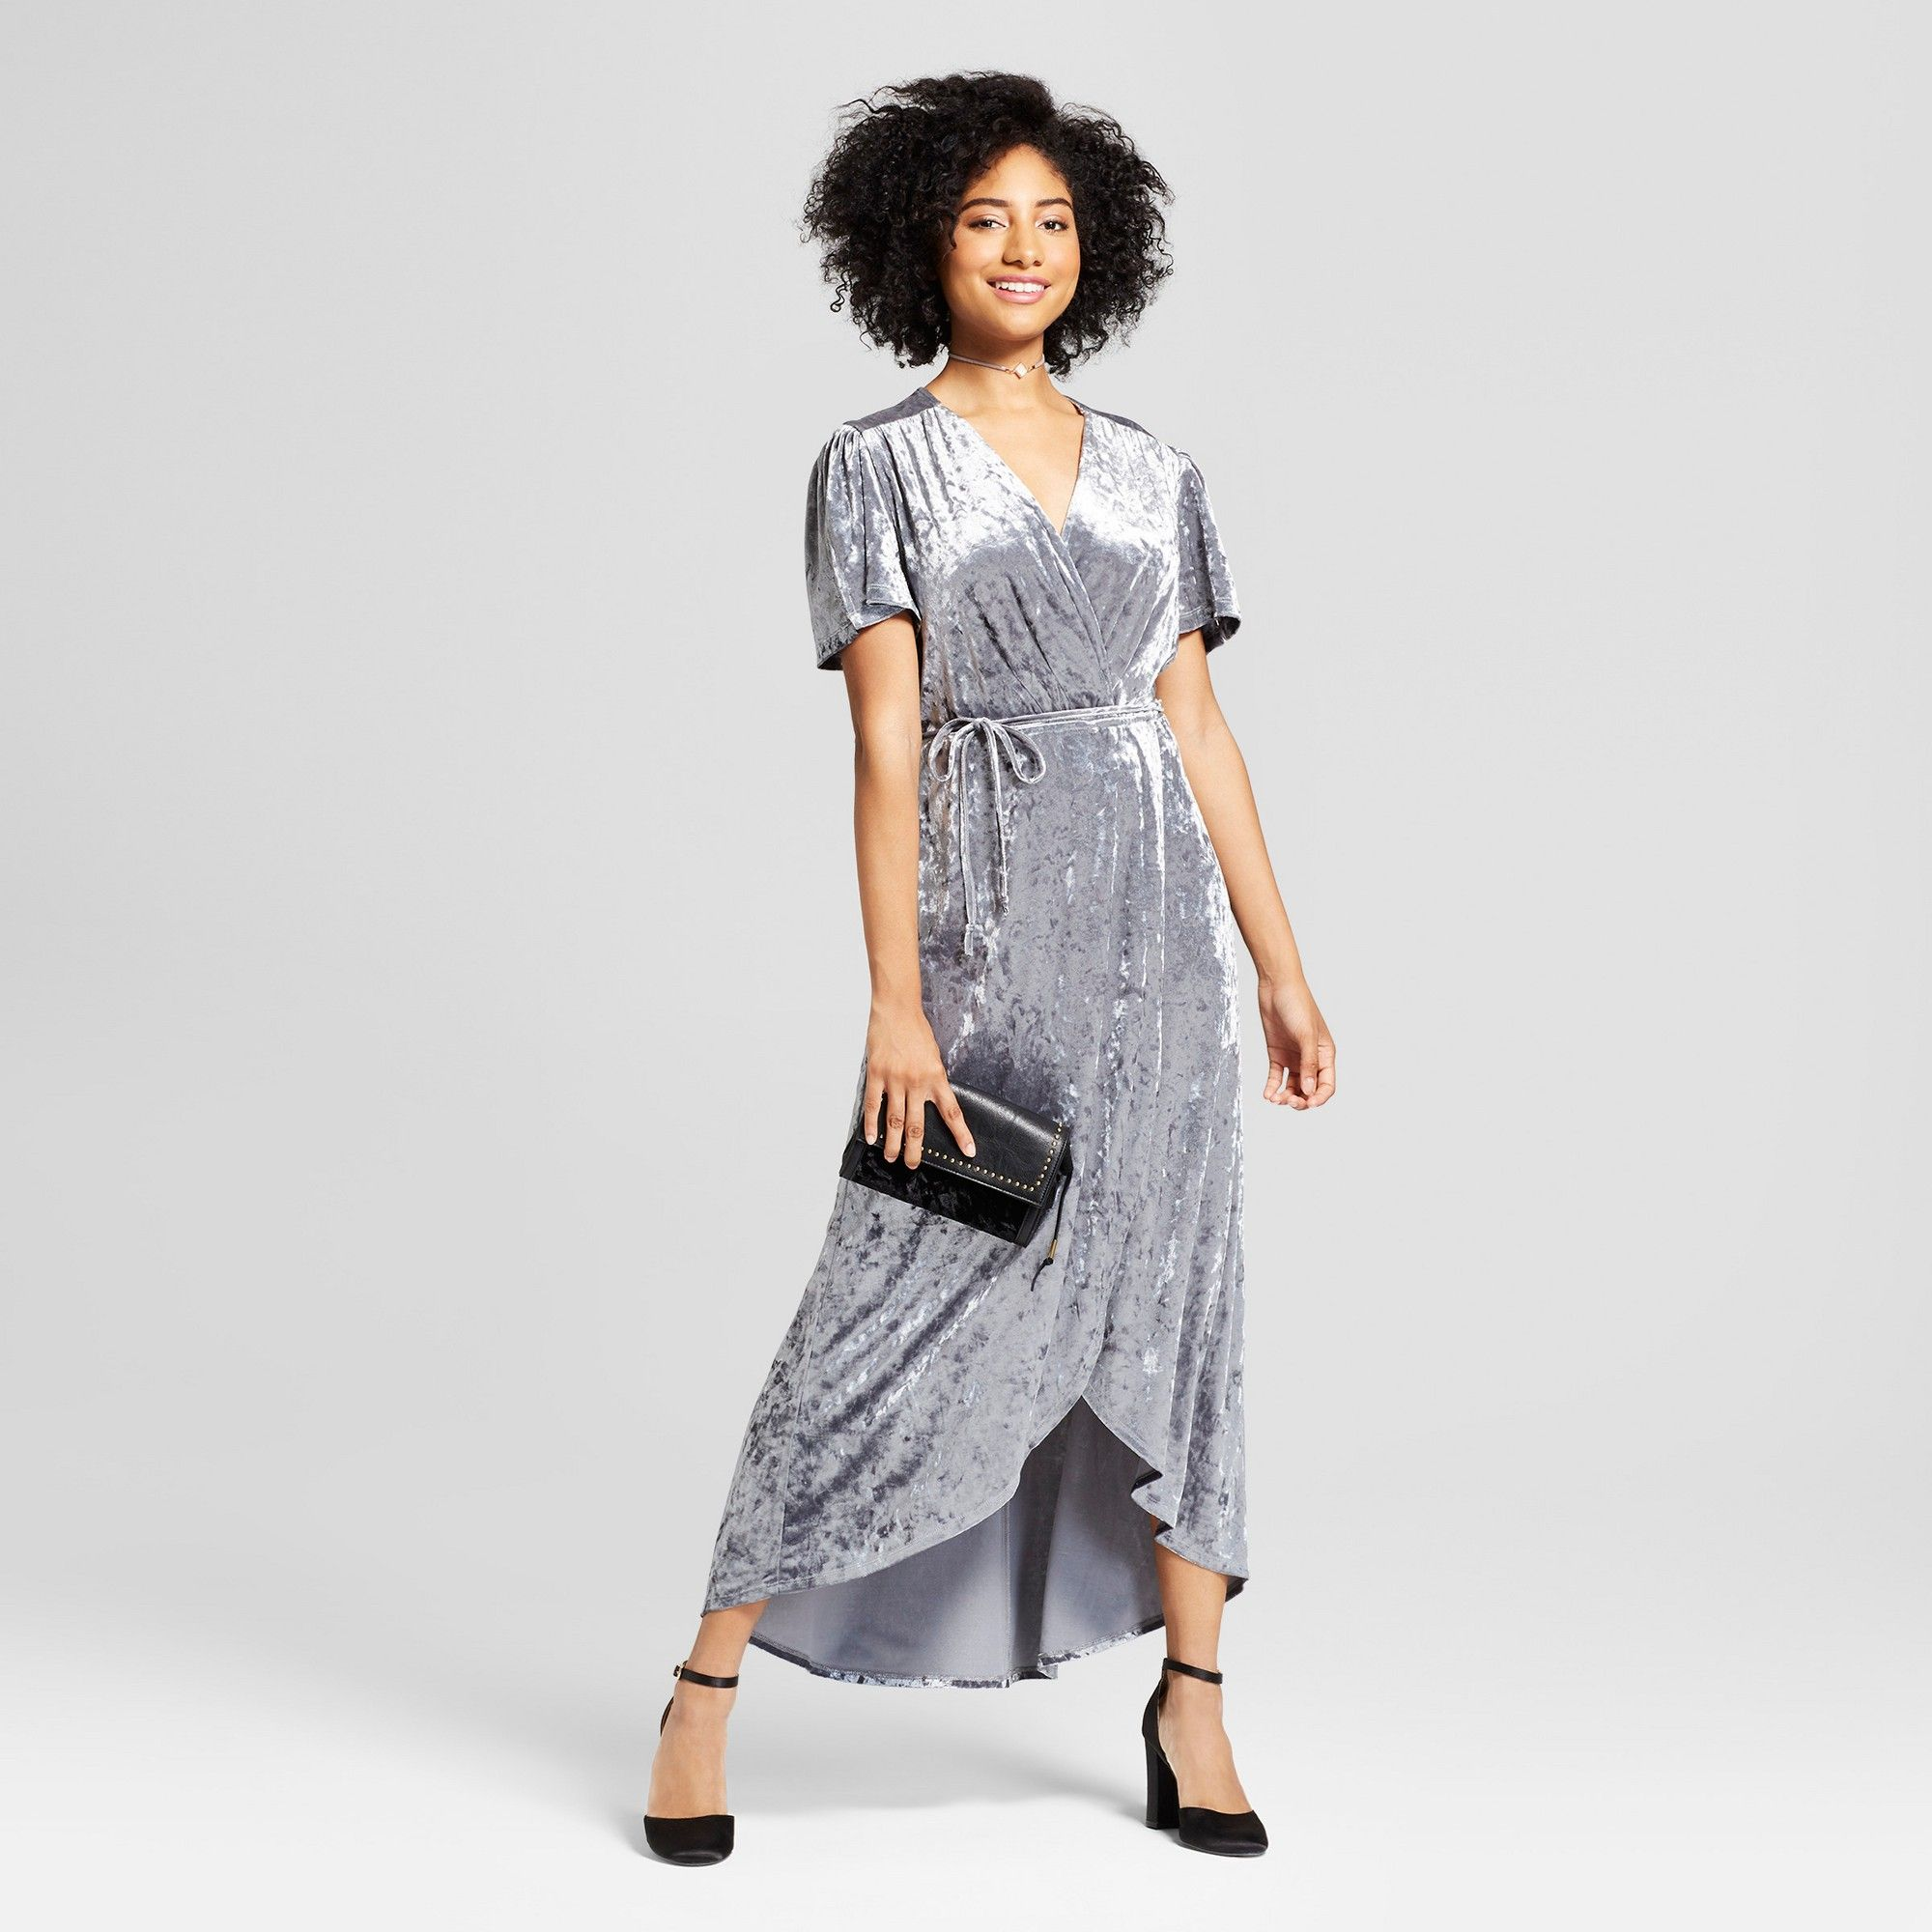 96223bbf5754bc Women s Crushed Velvet Short Sleeve Maxi Dress - Xhilaration Silver ...